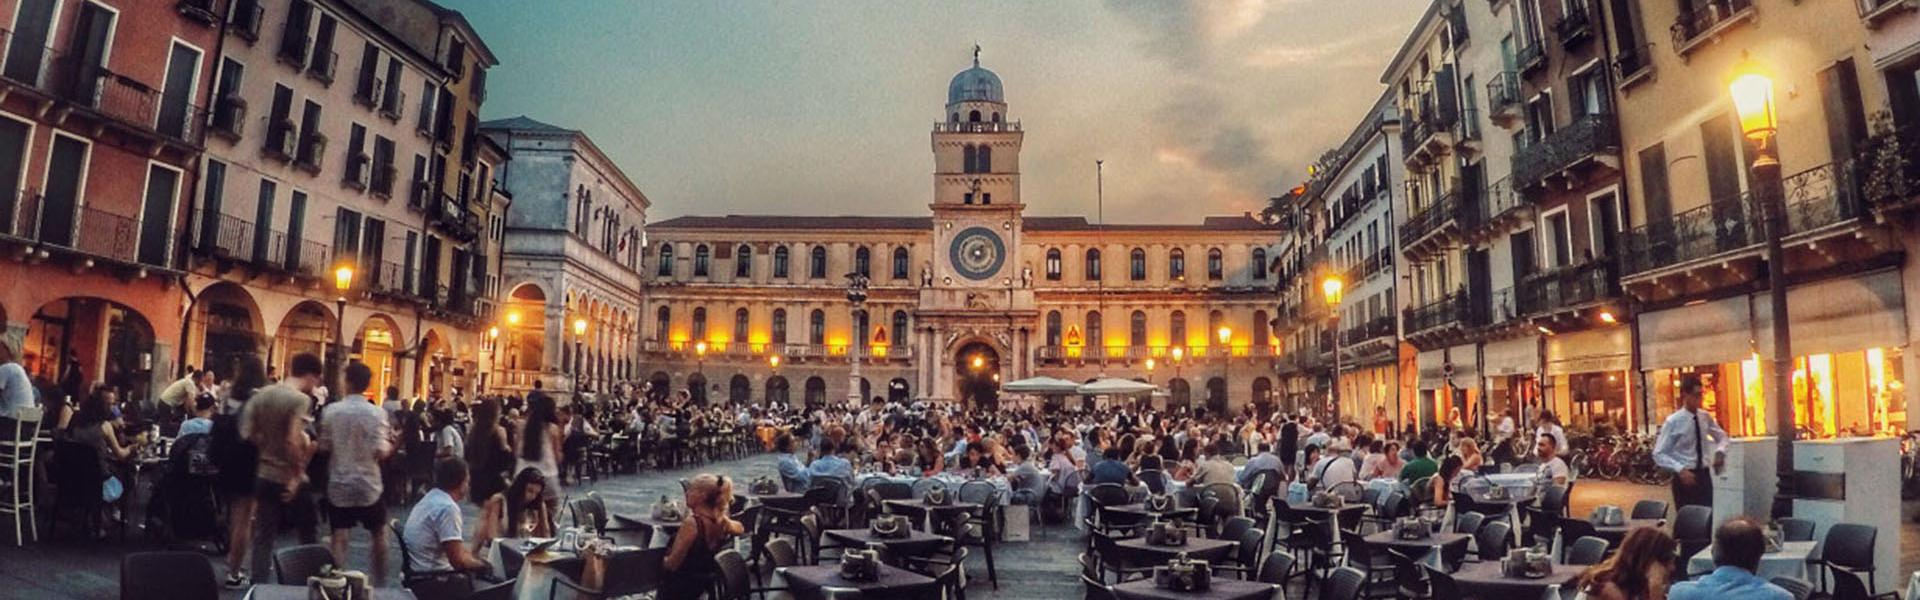 Padova Weekend ©Emiliano Poci